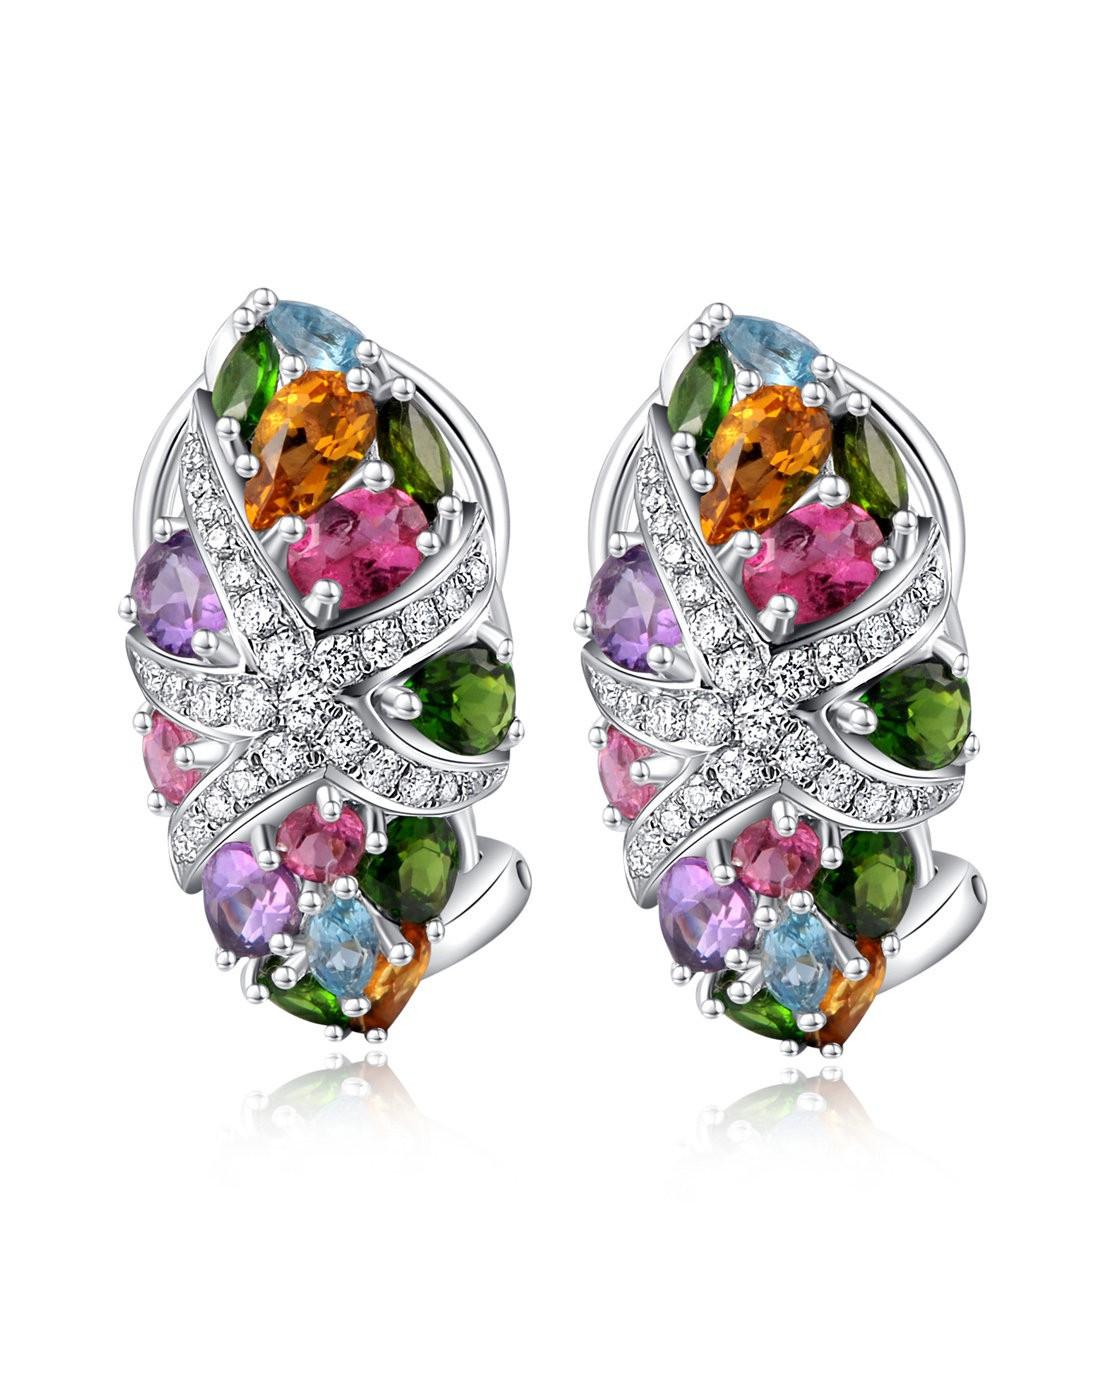 enzo珠宝专场-华丽18k白金天然彩宝镶钻海星耳环